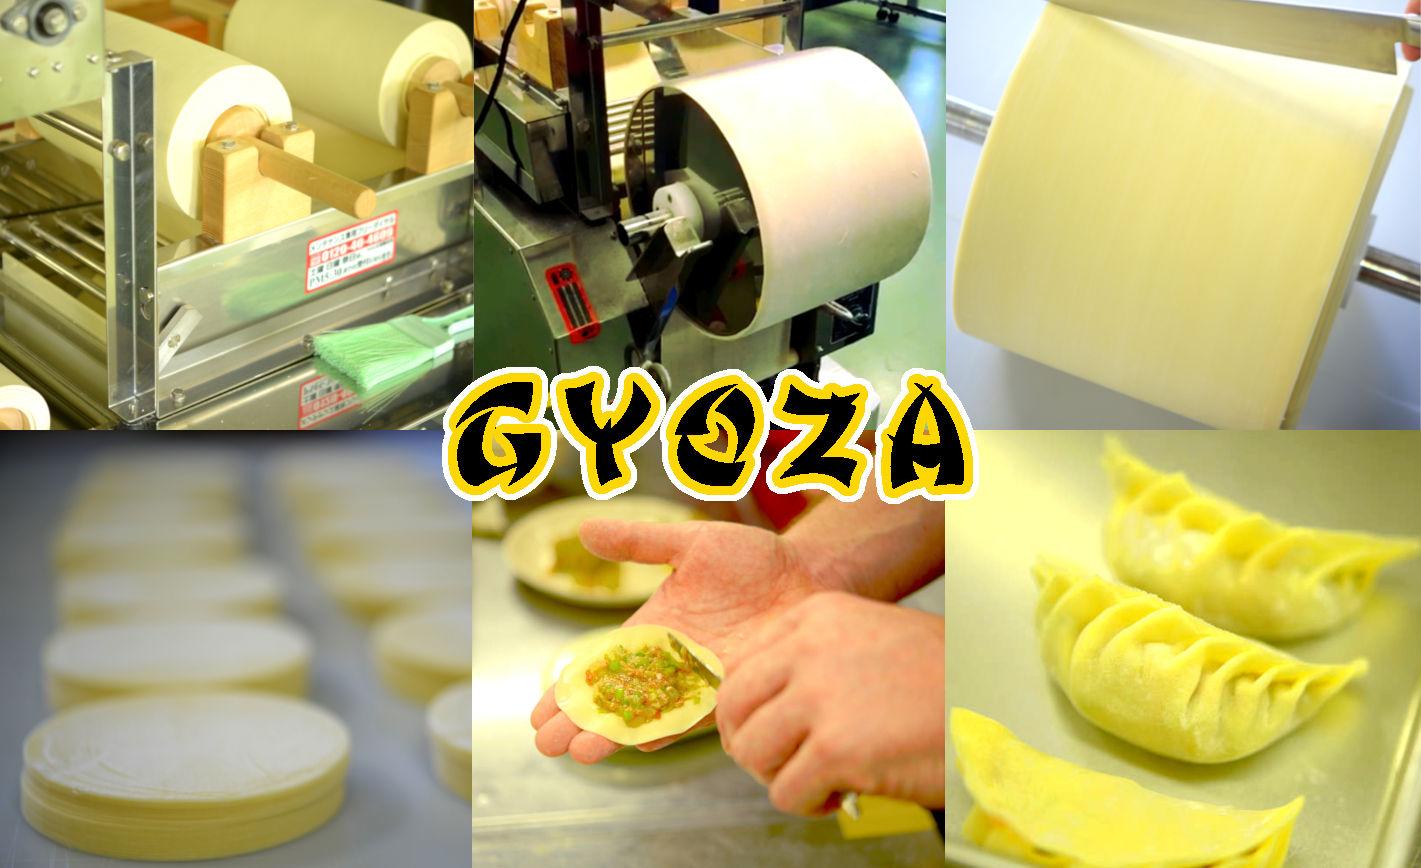 production of gyoza wrappers on a ramen machine